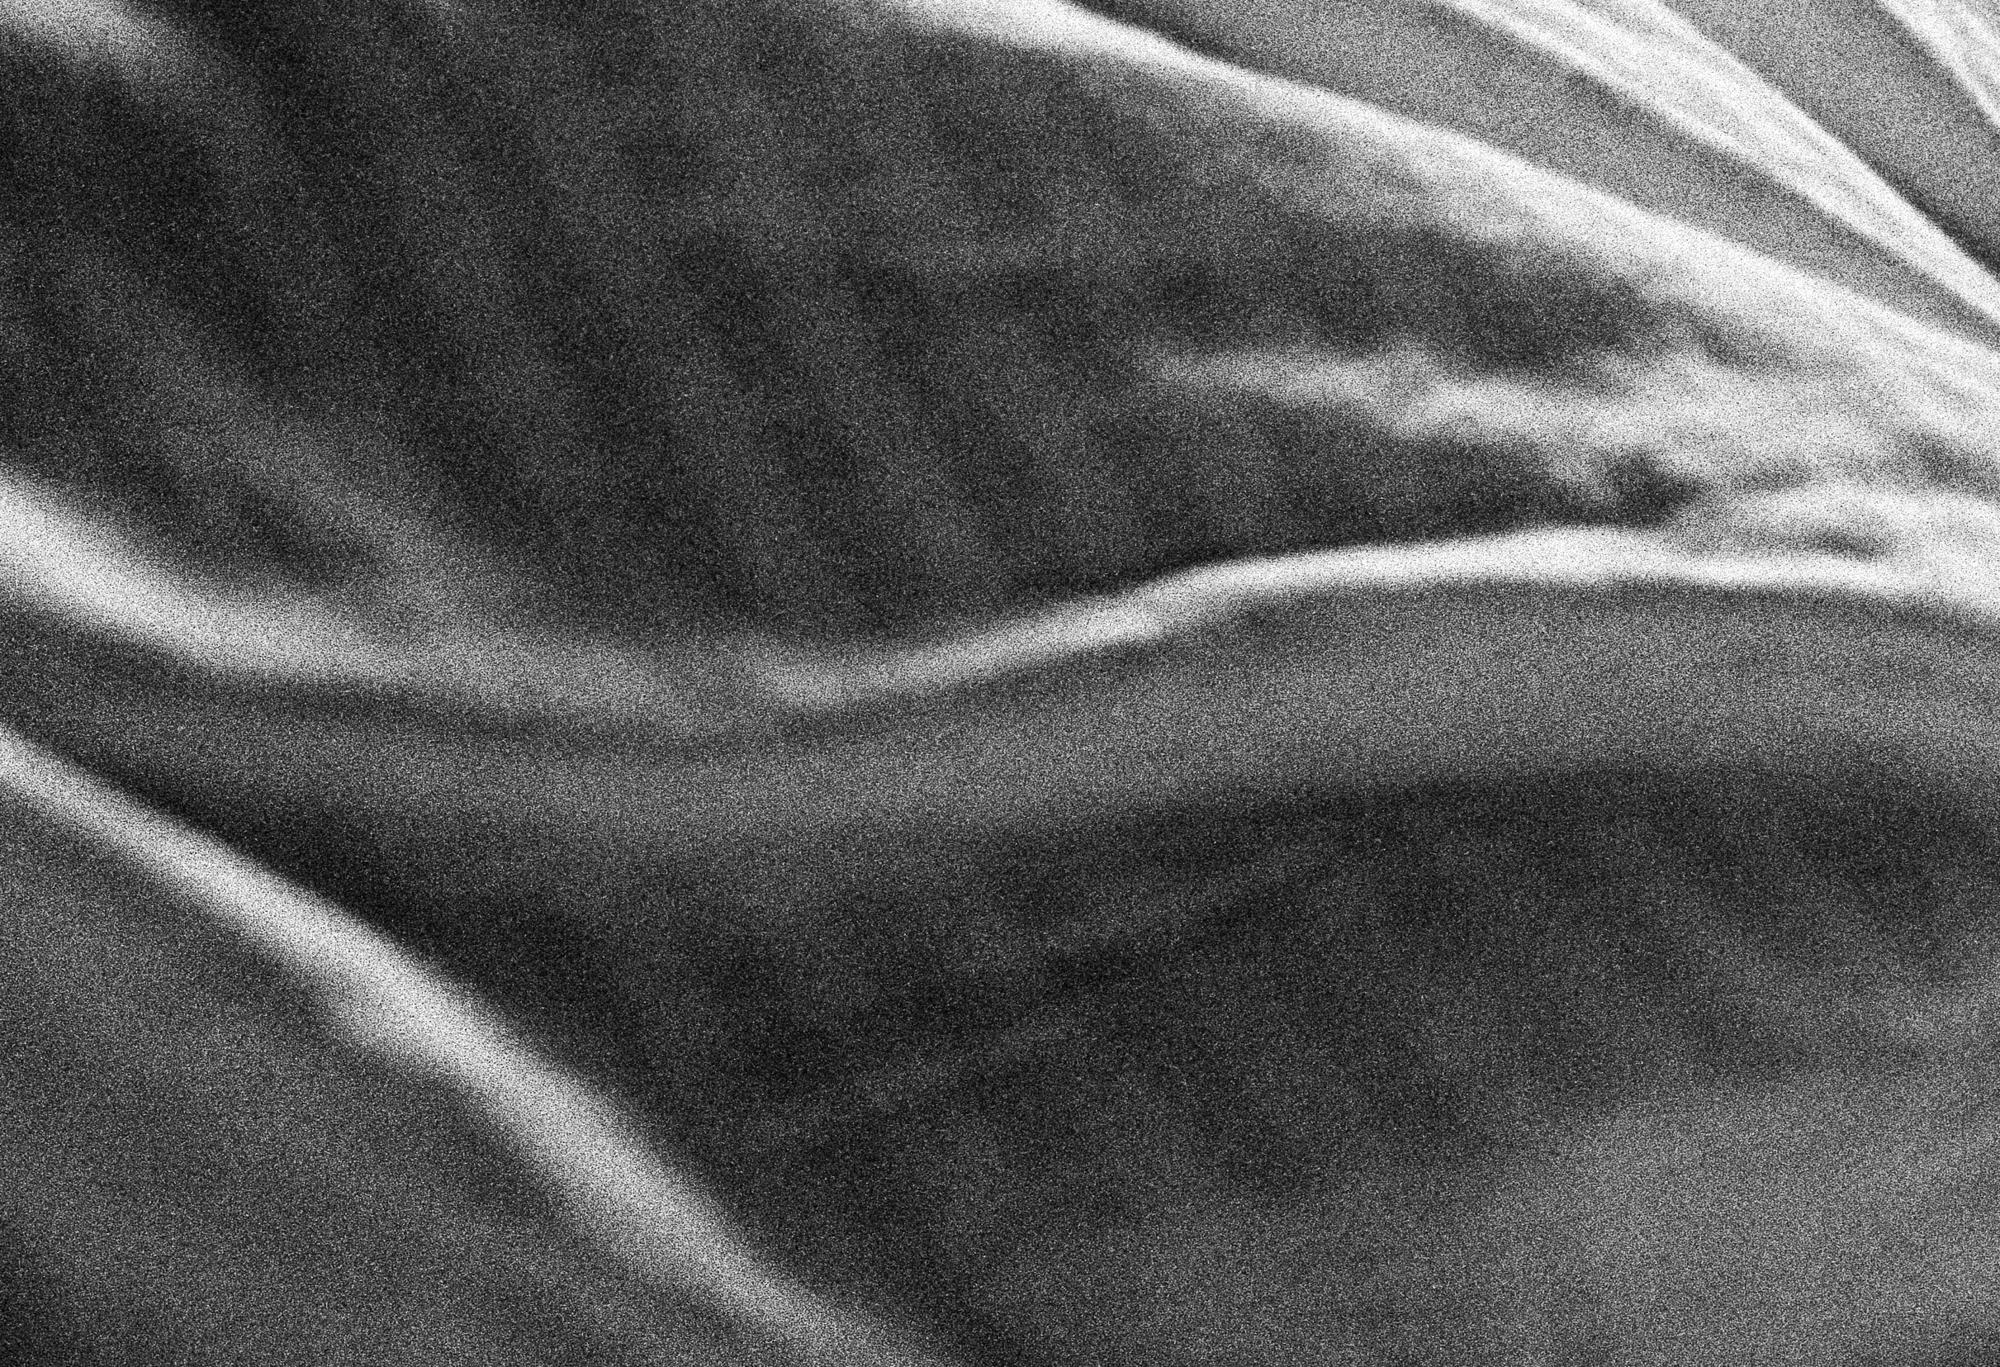 Barcena-IntimacyCurated-03.jpg